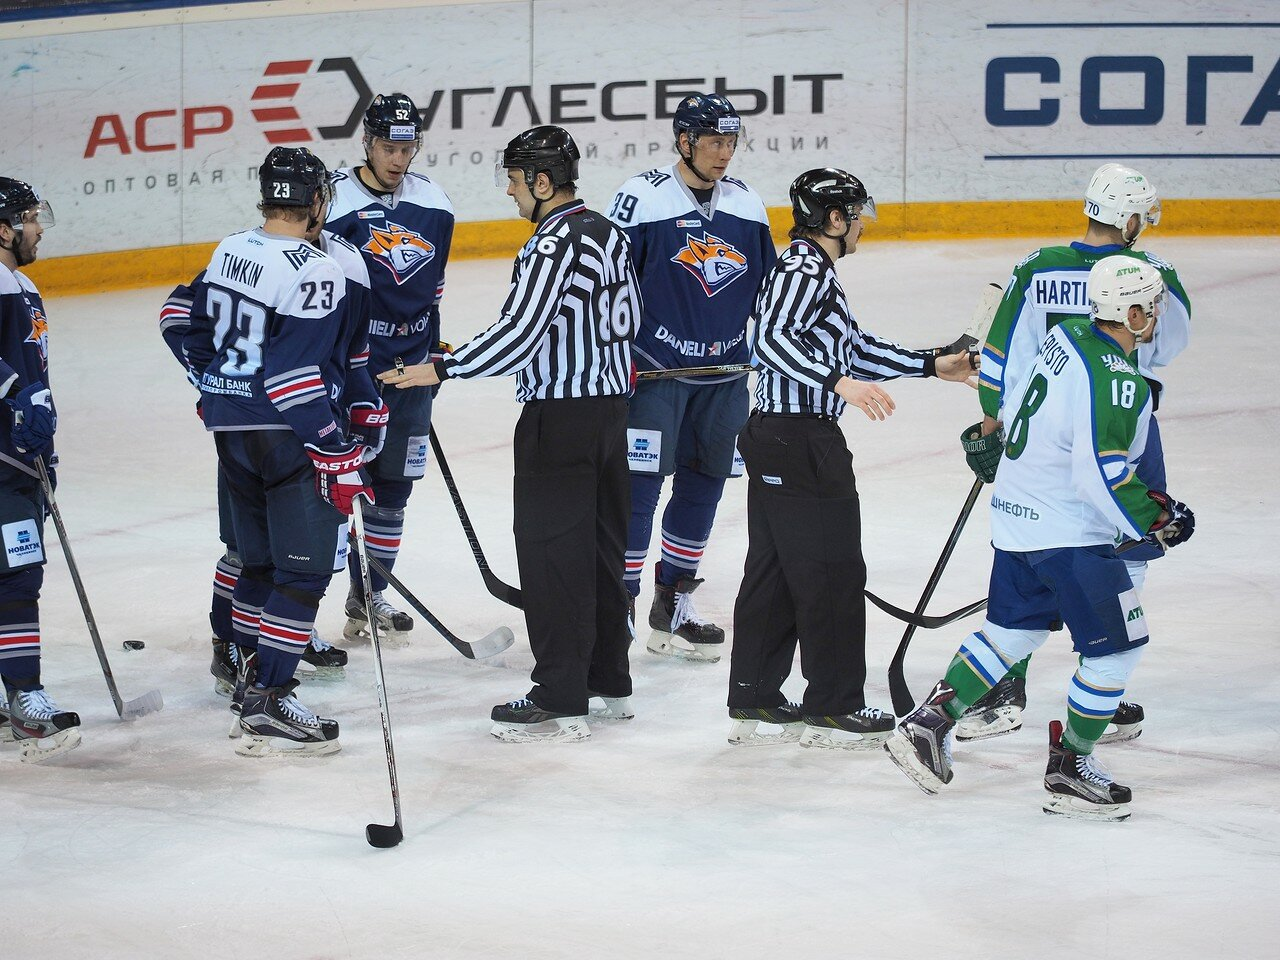 33Плей-офф 2016 Восток Финал Металлург - Салават Юлаев 25.03.2016